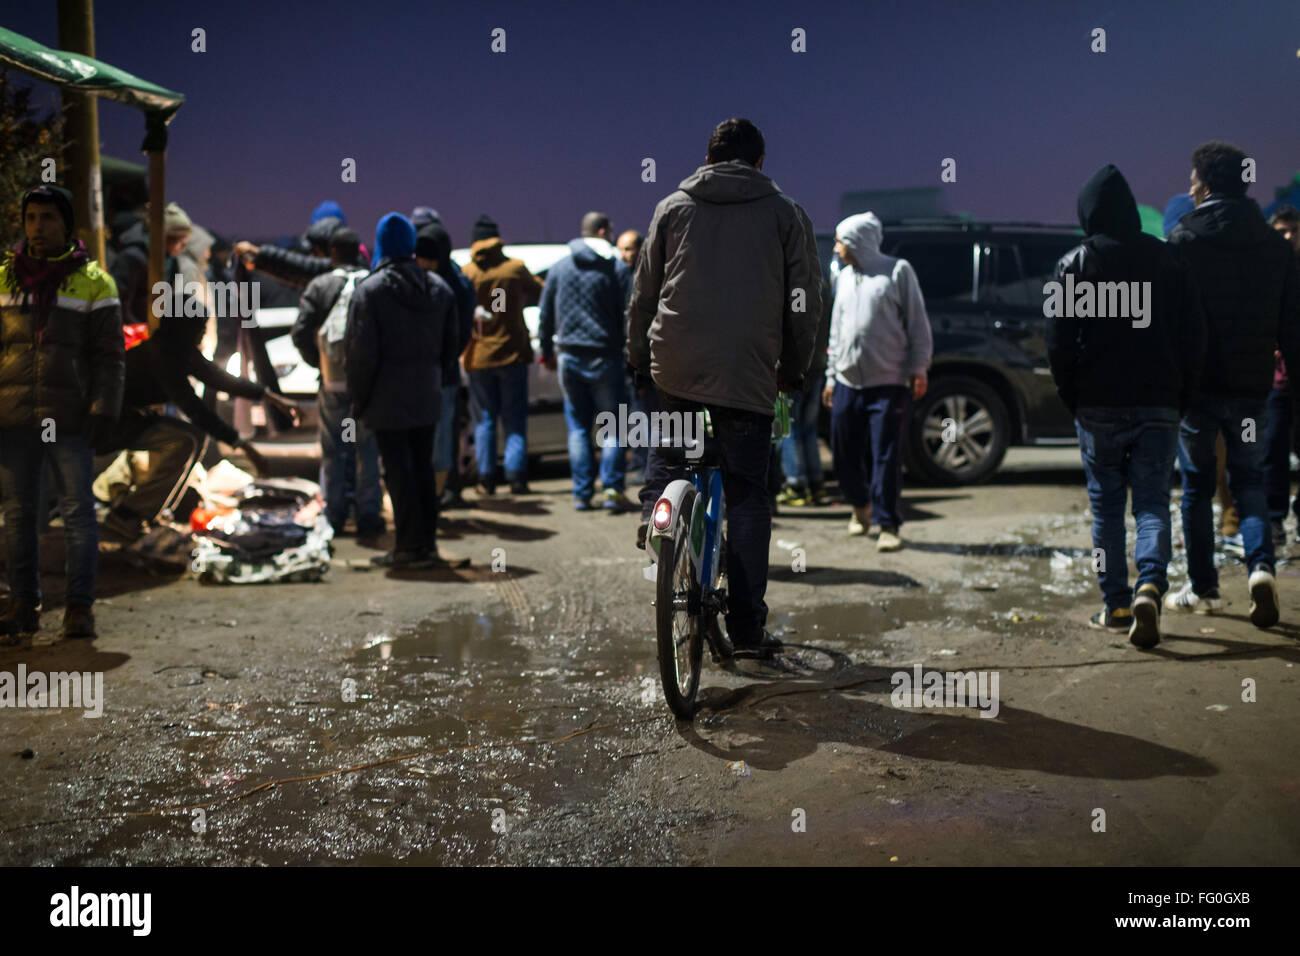 Afghanischer Flüchtling Stockfotos & Afghanischer Flüchtling Bilder ...